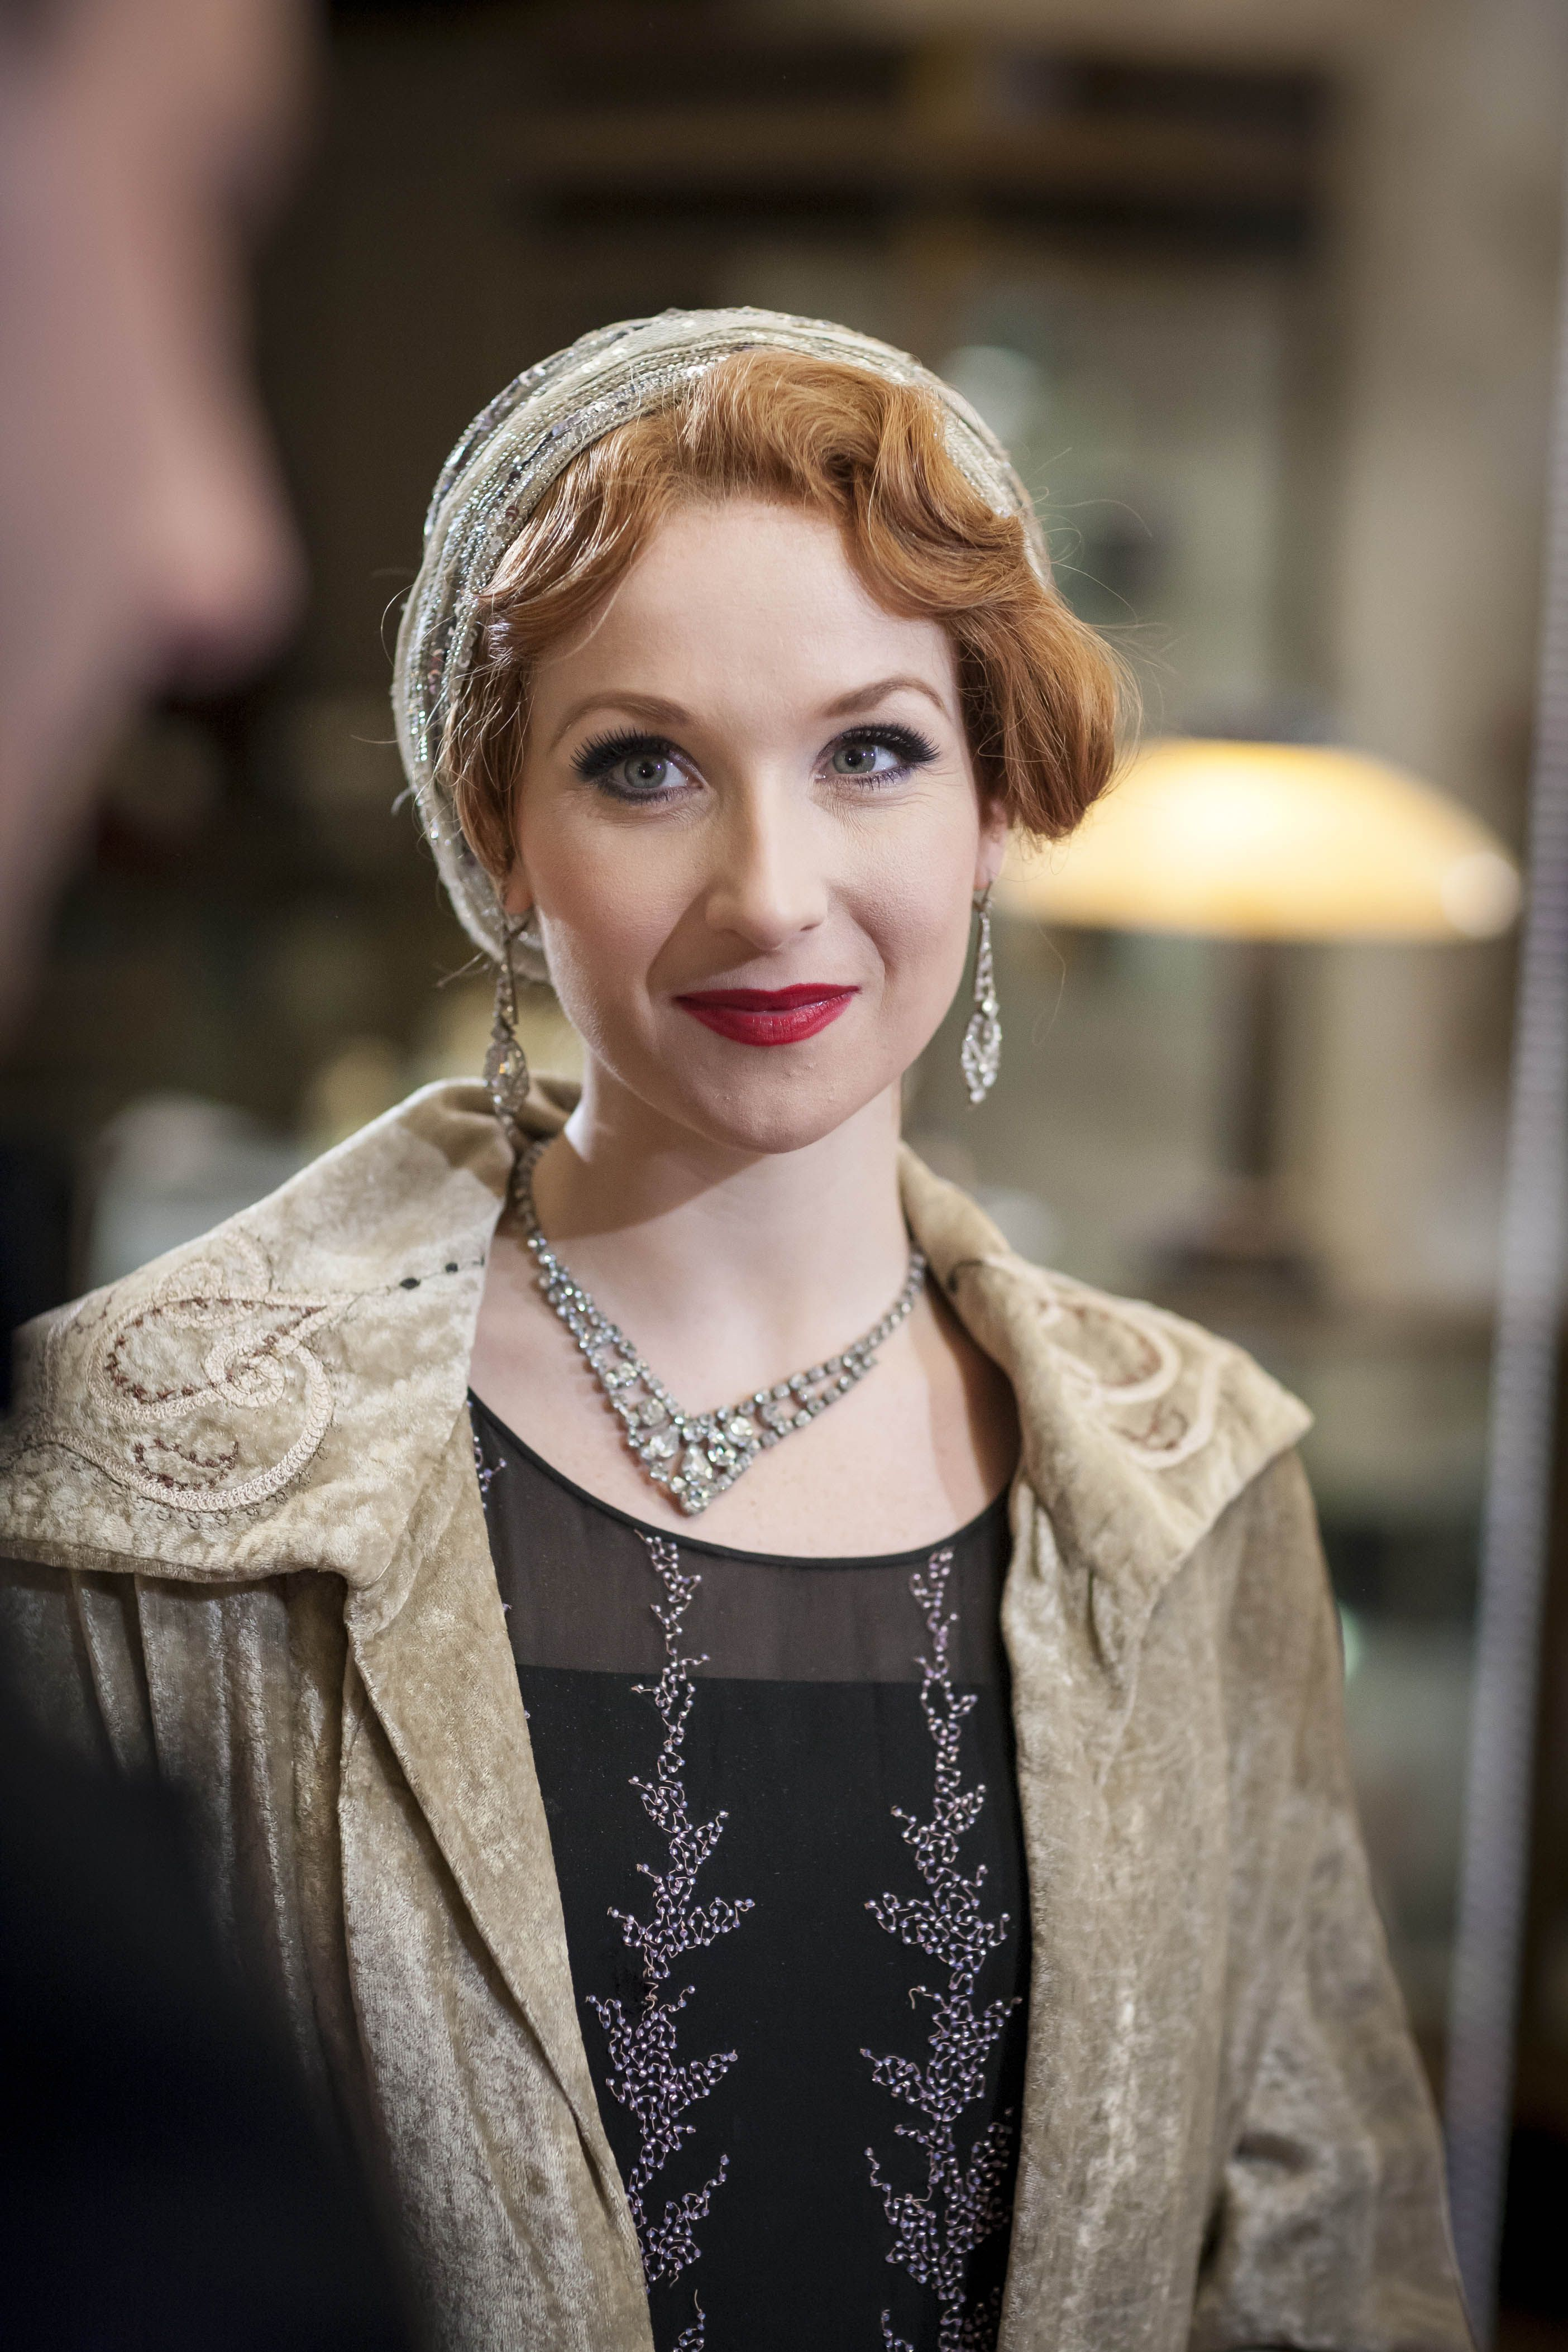 Amy Beth Hayes kitty edwards - amy beth hayes in mr selfridge season 4, set